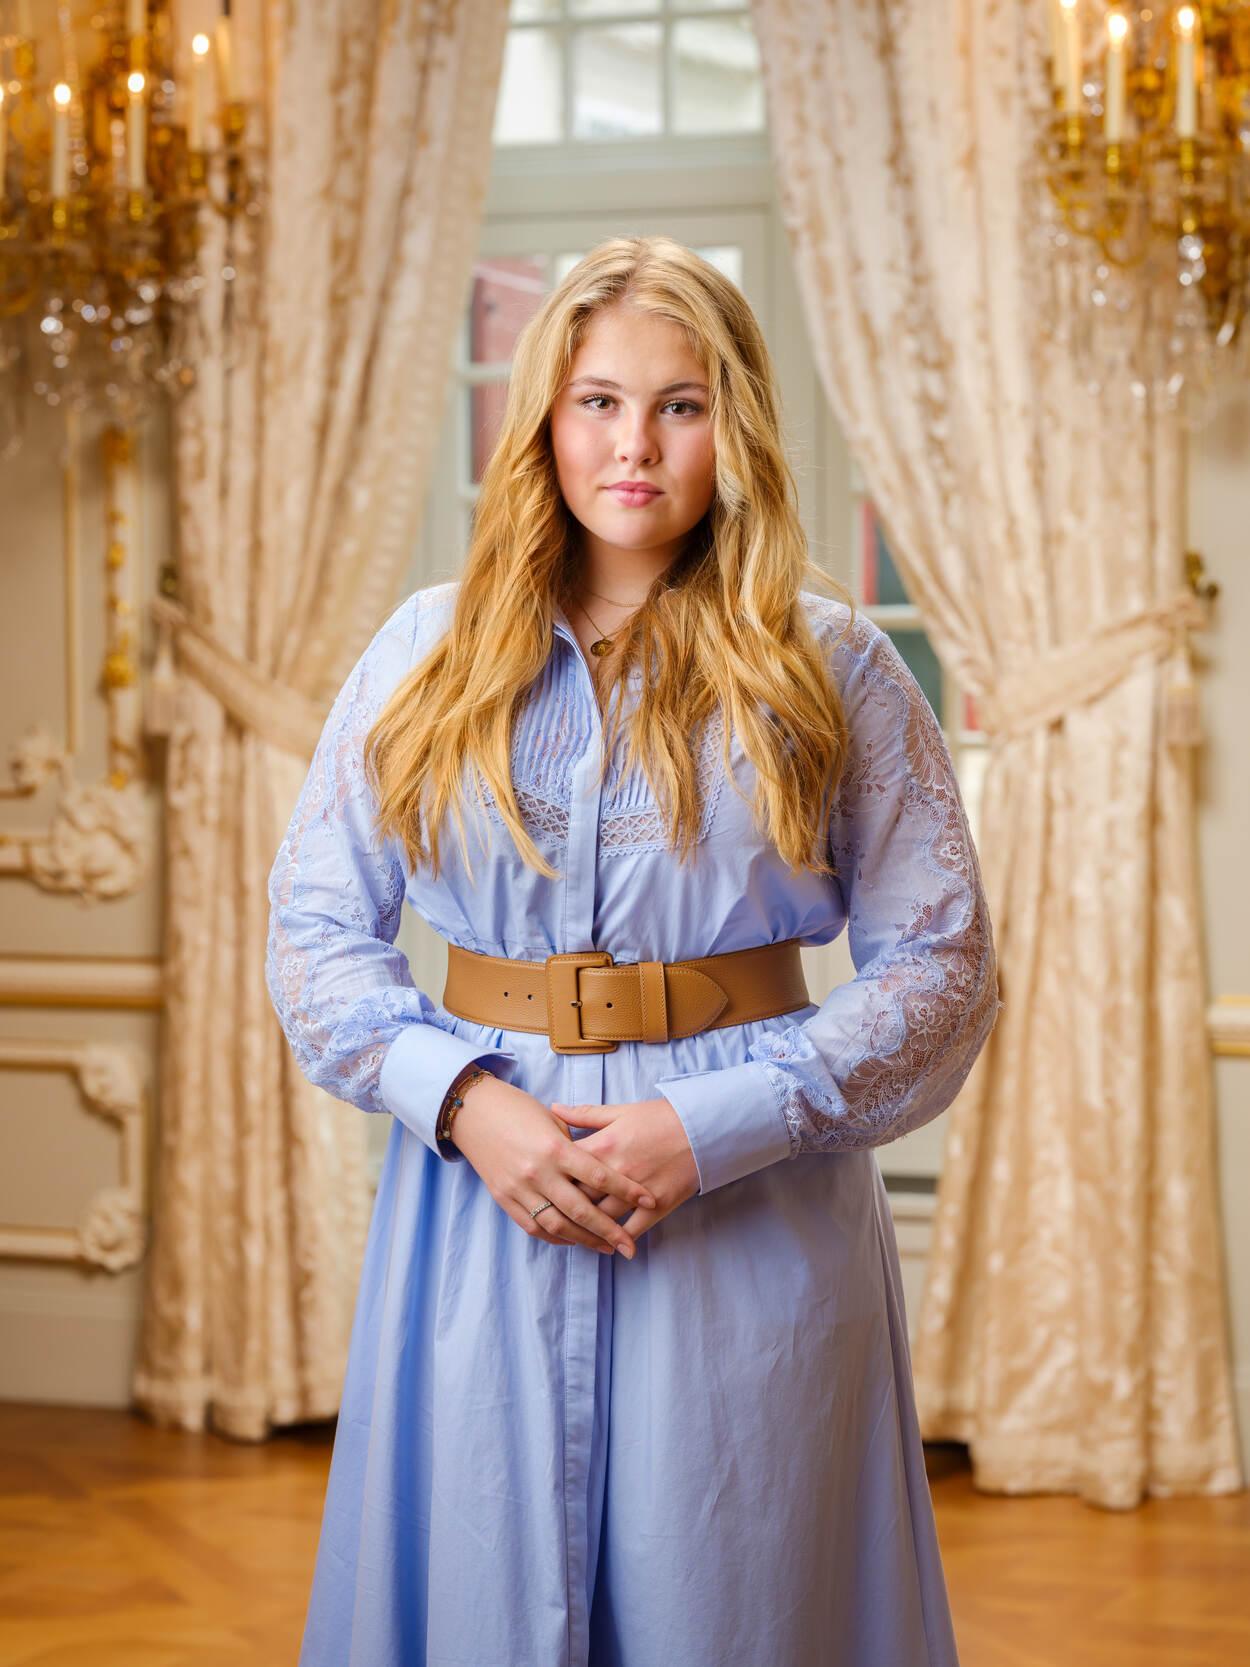 https://www.royal-house.nl/binaries/large/content/gallery/royalhouse/content-afbeeldingen/portretfoto-s/de-prinses-van-oranje/2020-princess-of-orange-1.jpg